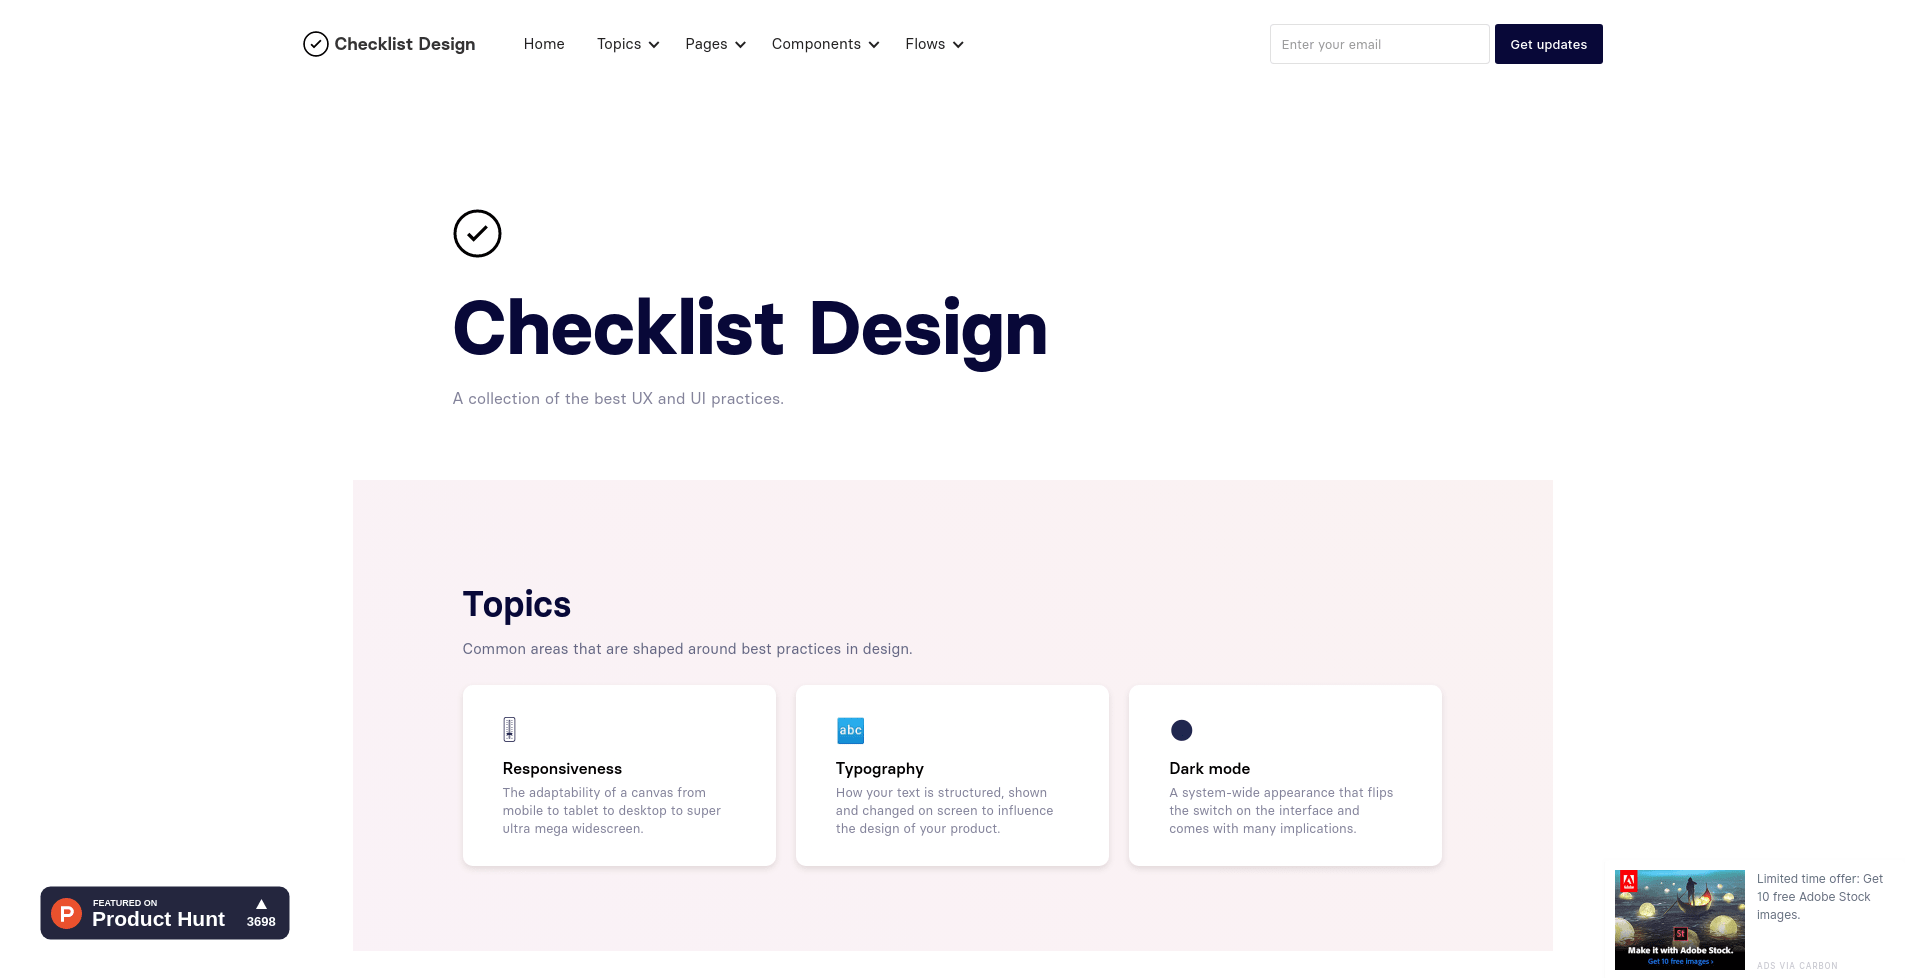 Checklist Design landing page